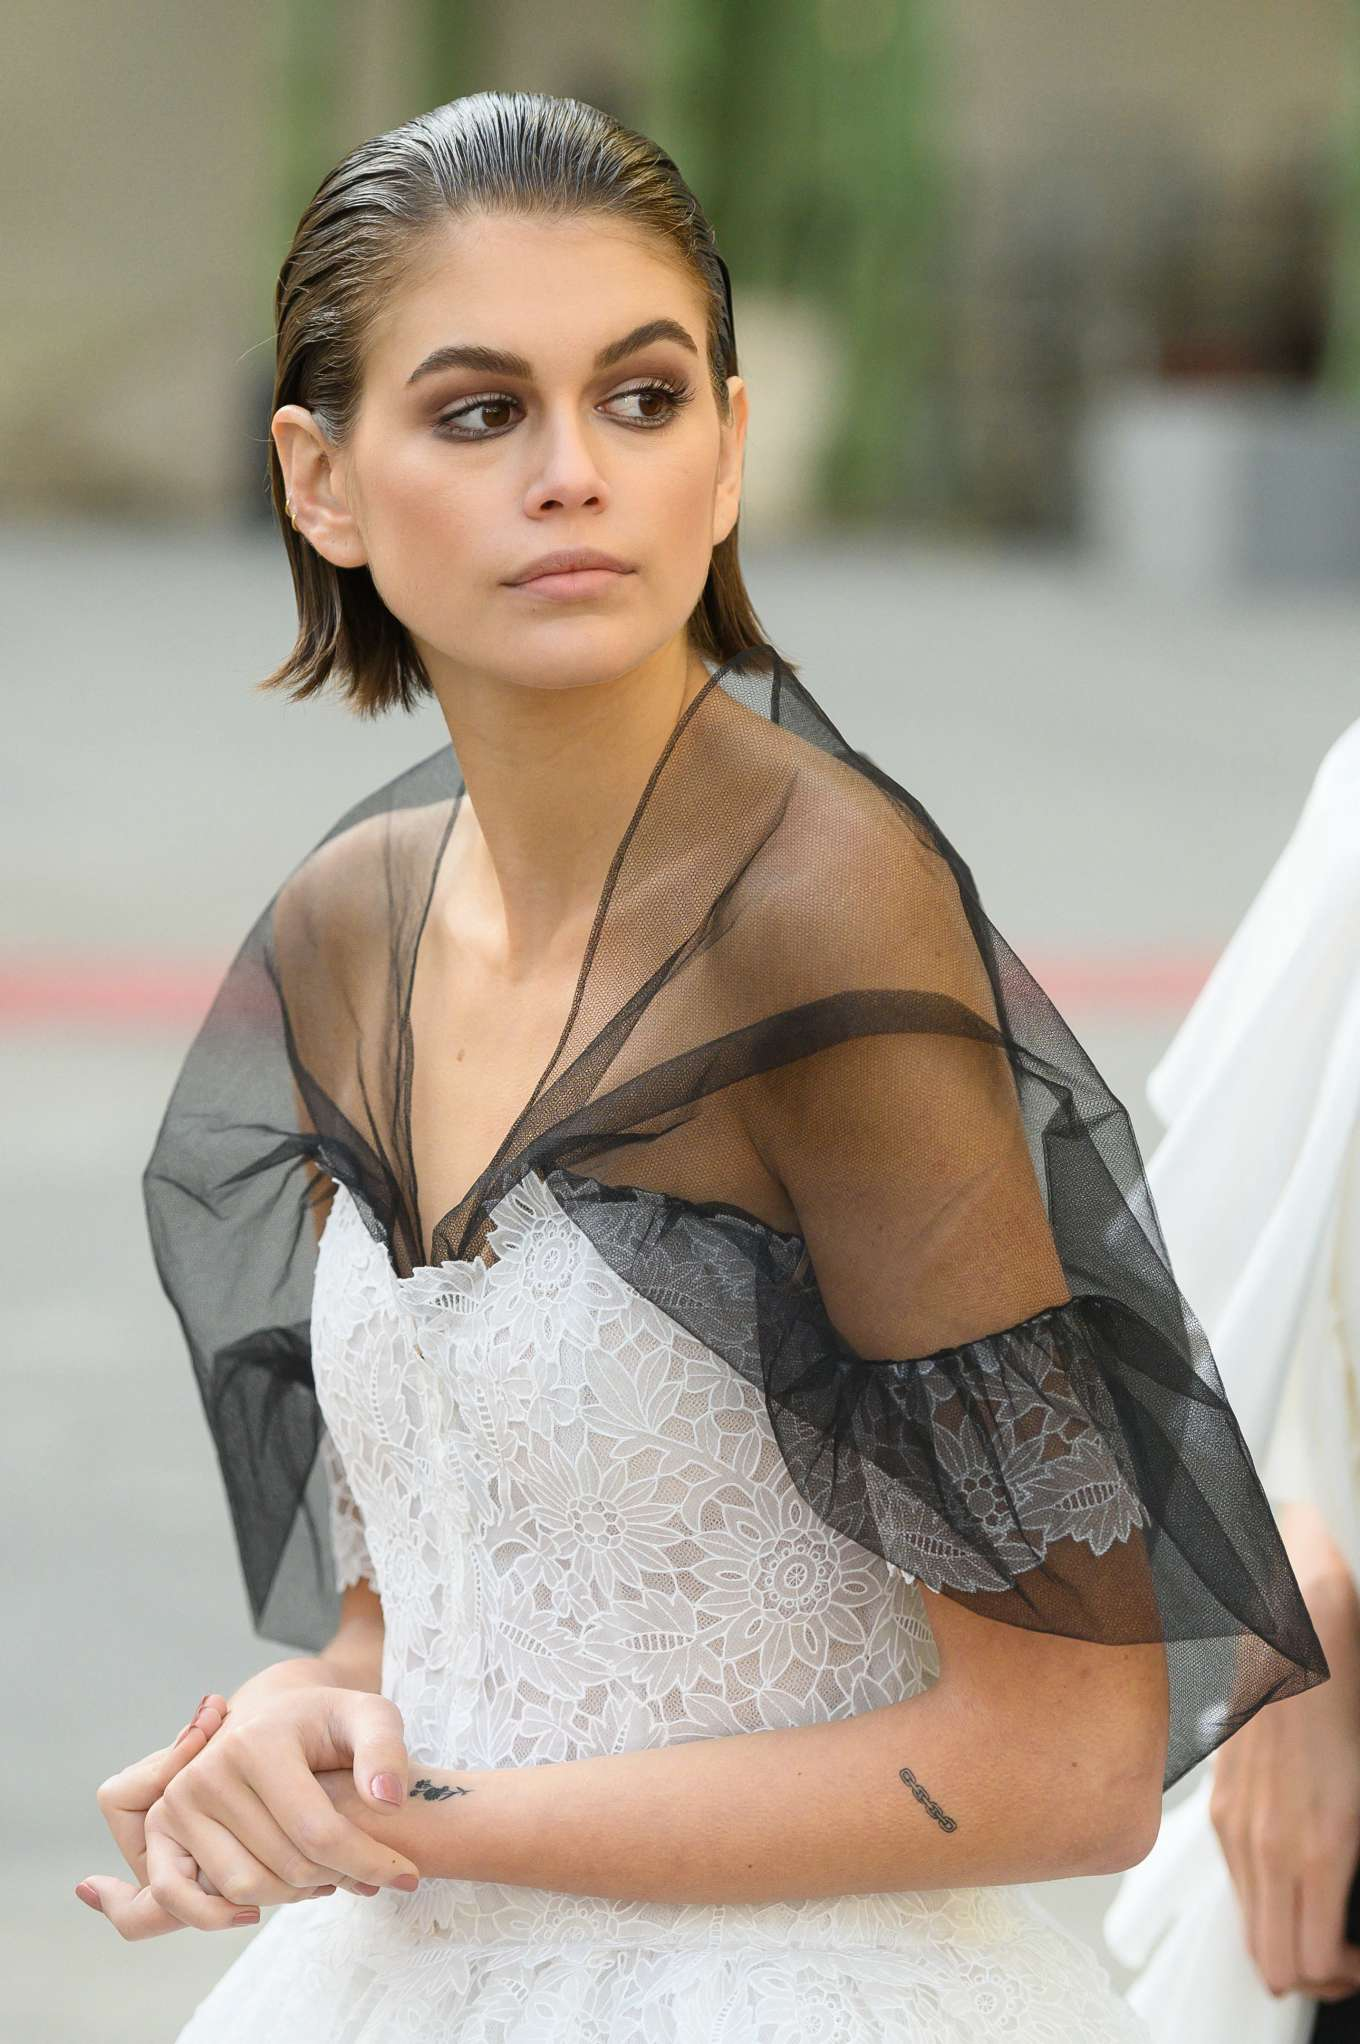 Kaia Gerber - Chanel Haute Couture Backstage Show in Paris